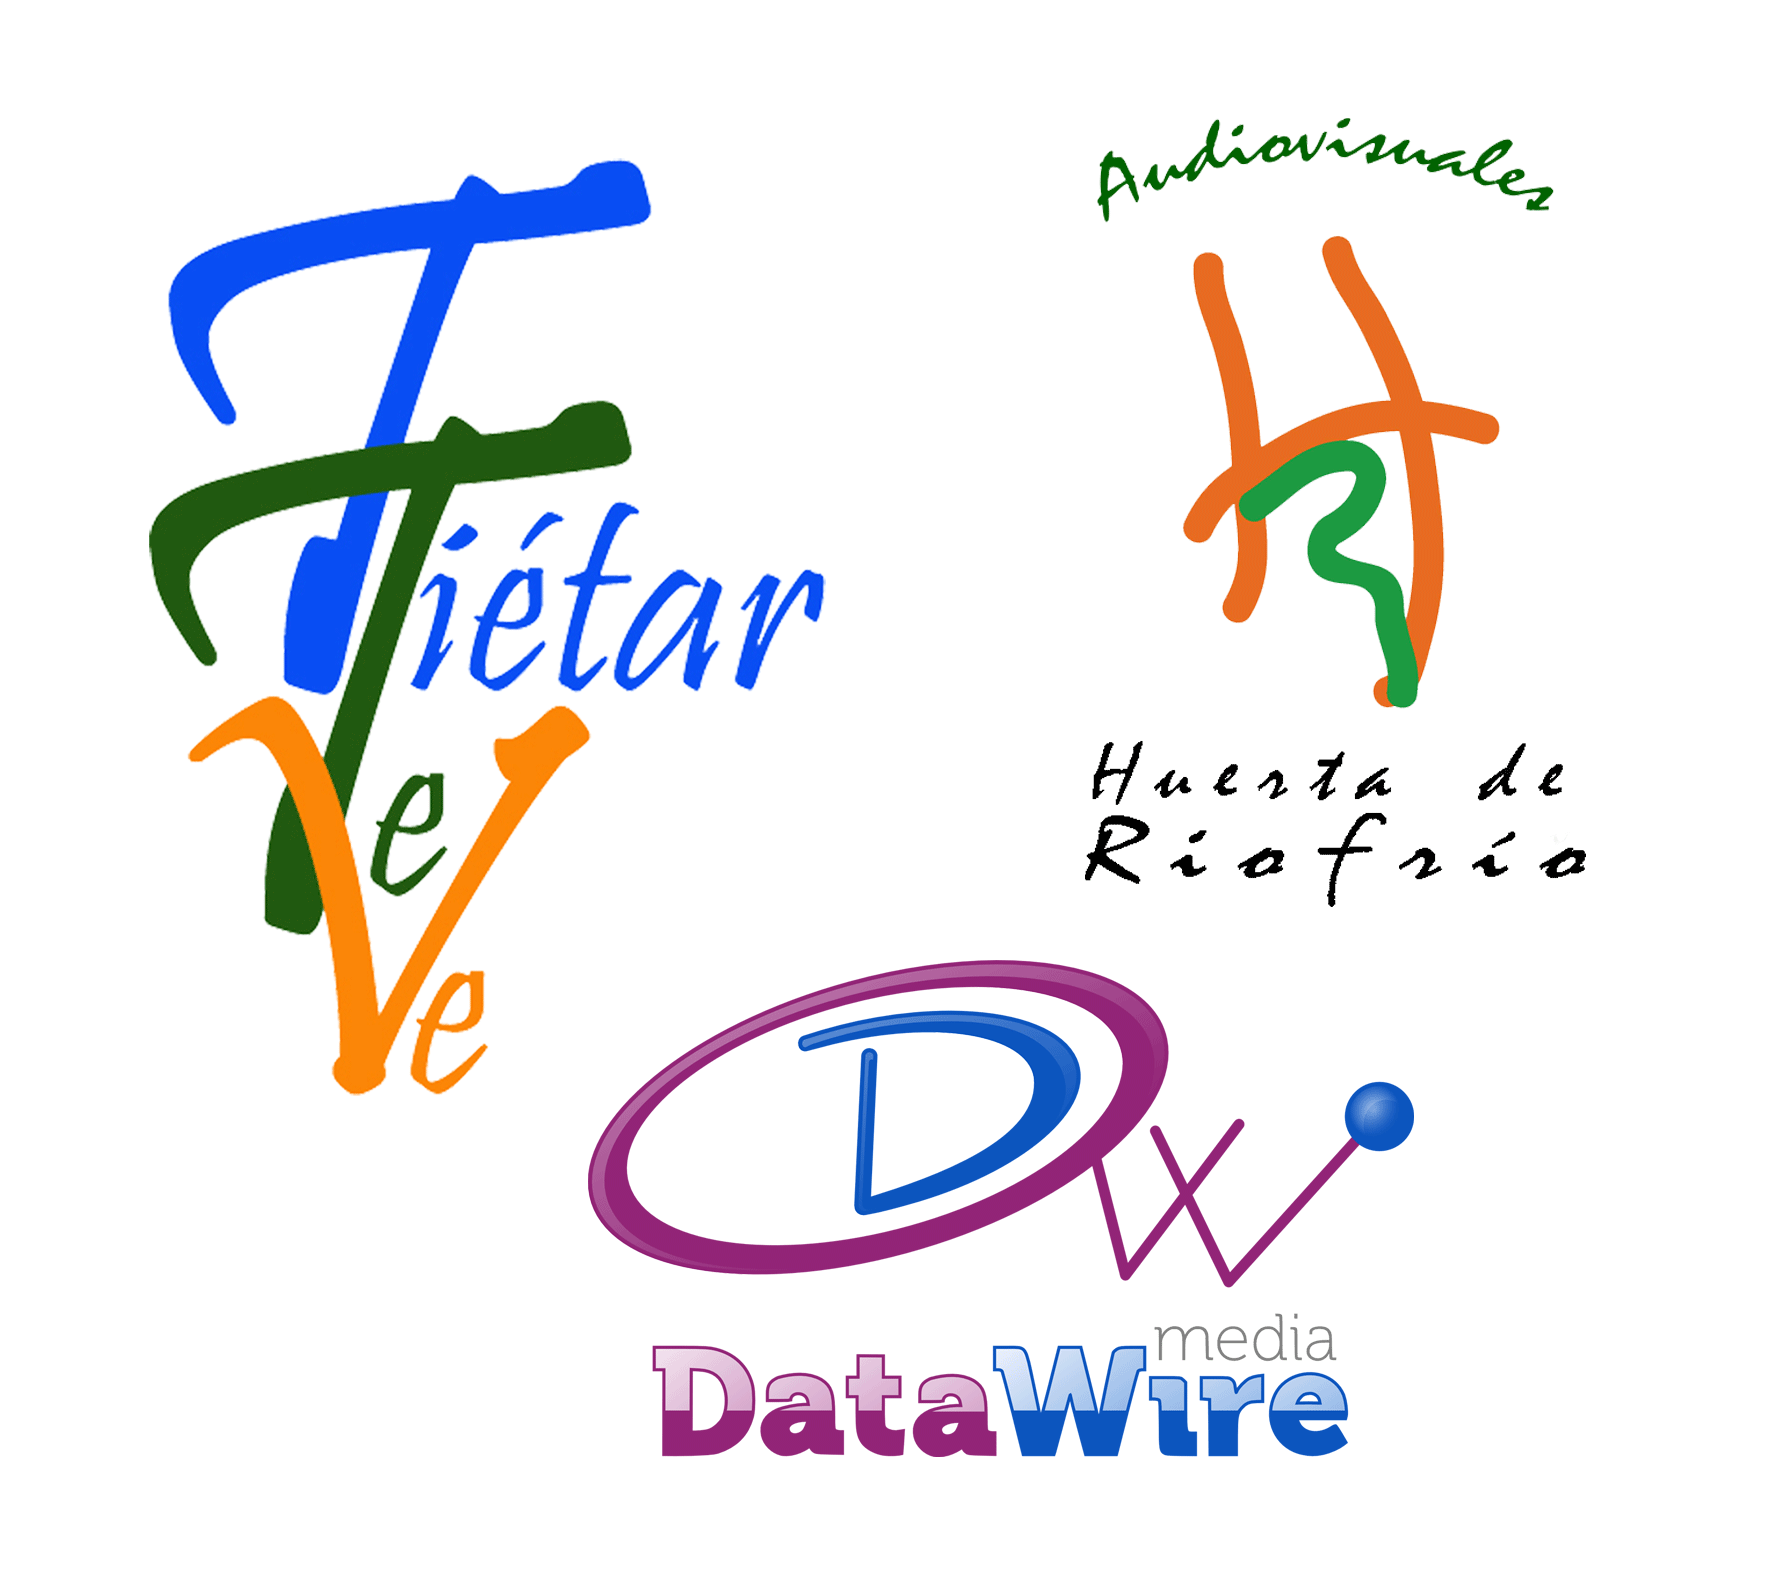 Datawire Media S.L. - TiétarTeVe - Audiovisuales Huerta de Riofrío